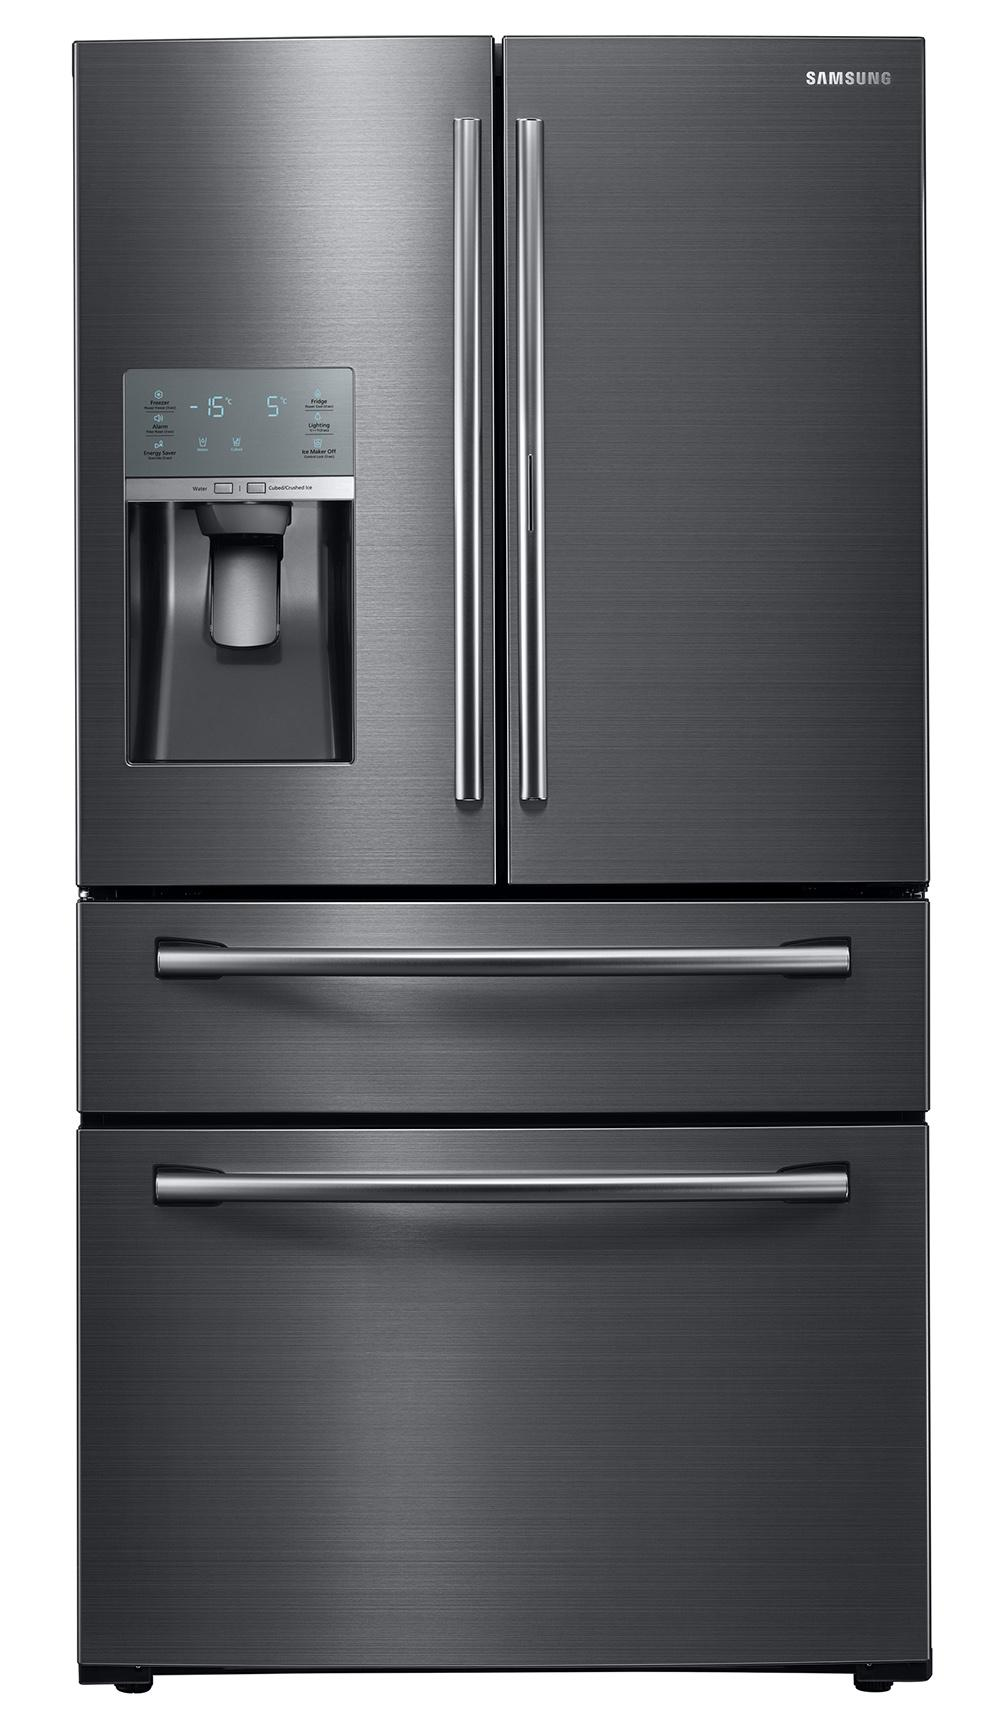 Rf28jbedbsr Samsung Rf28jbedbsr French Door Refrigerators